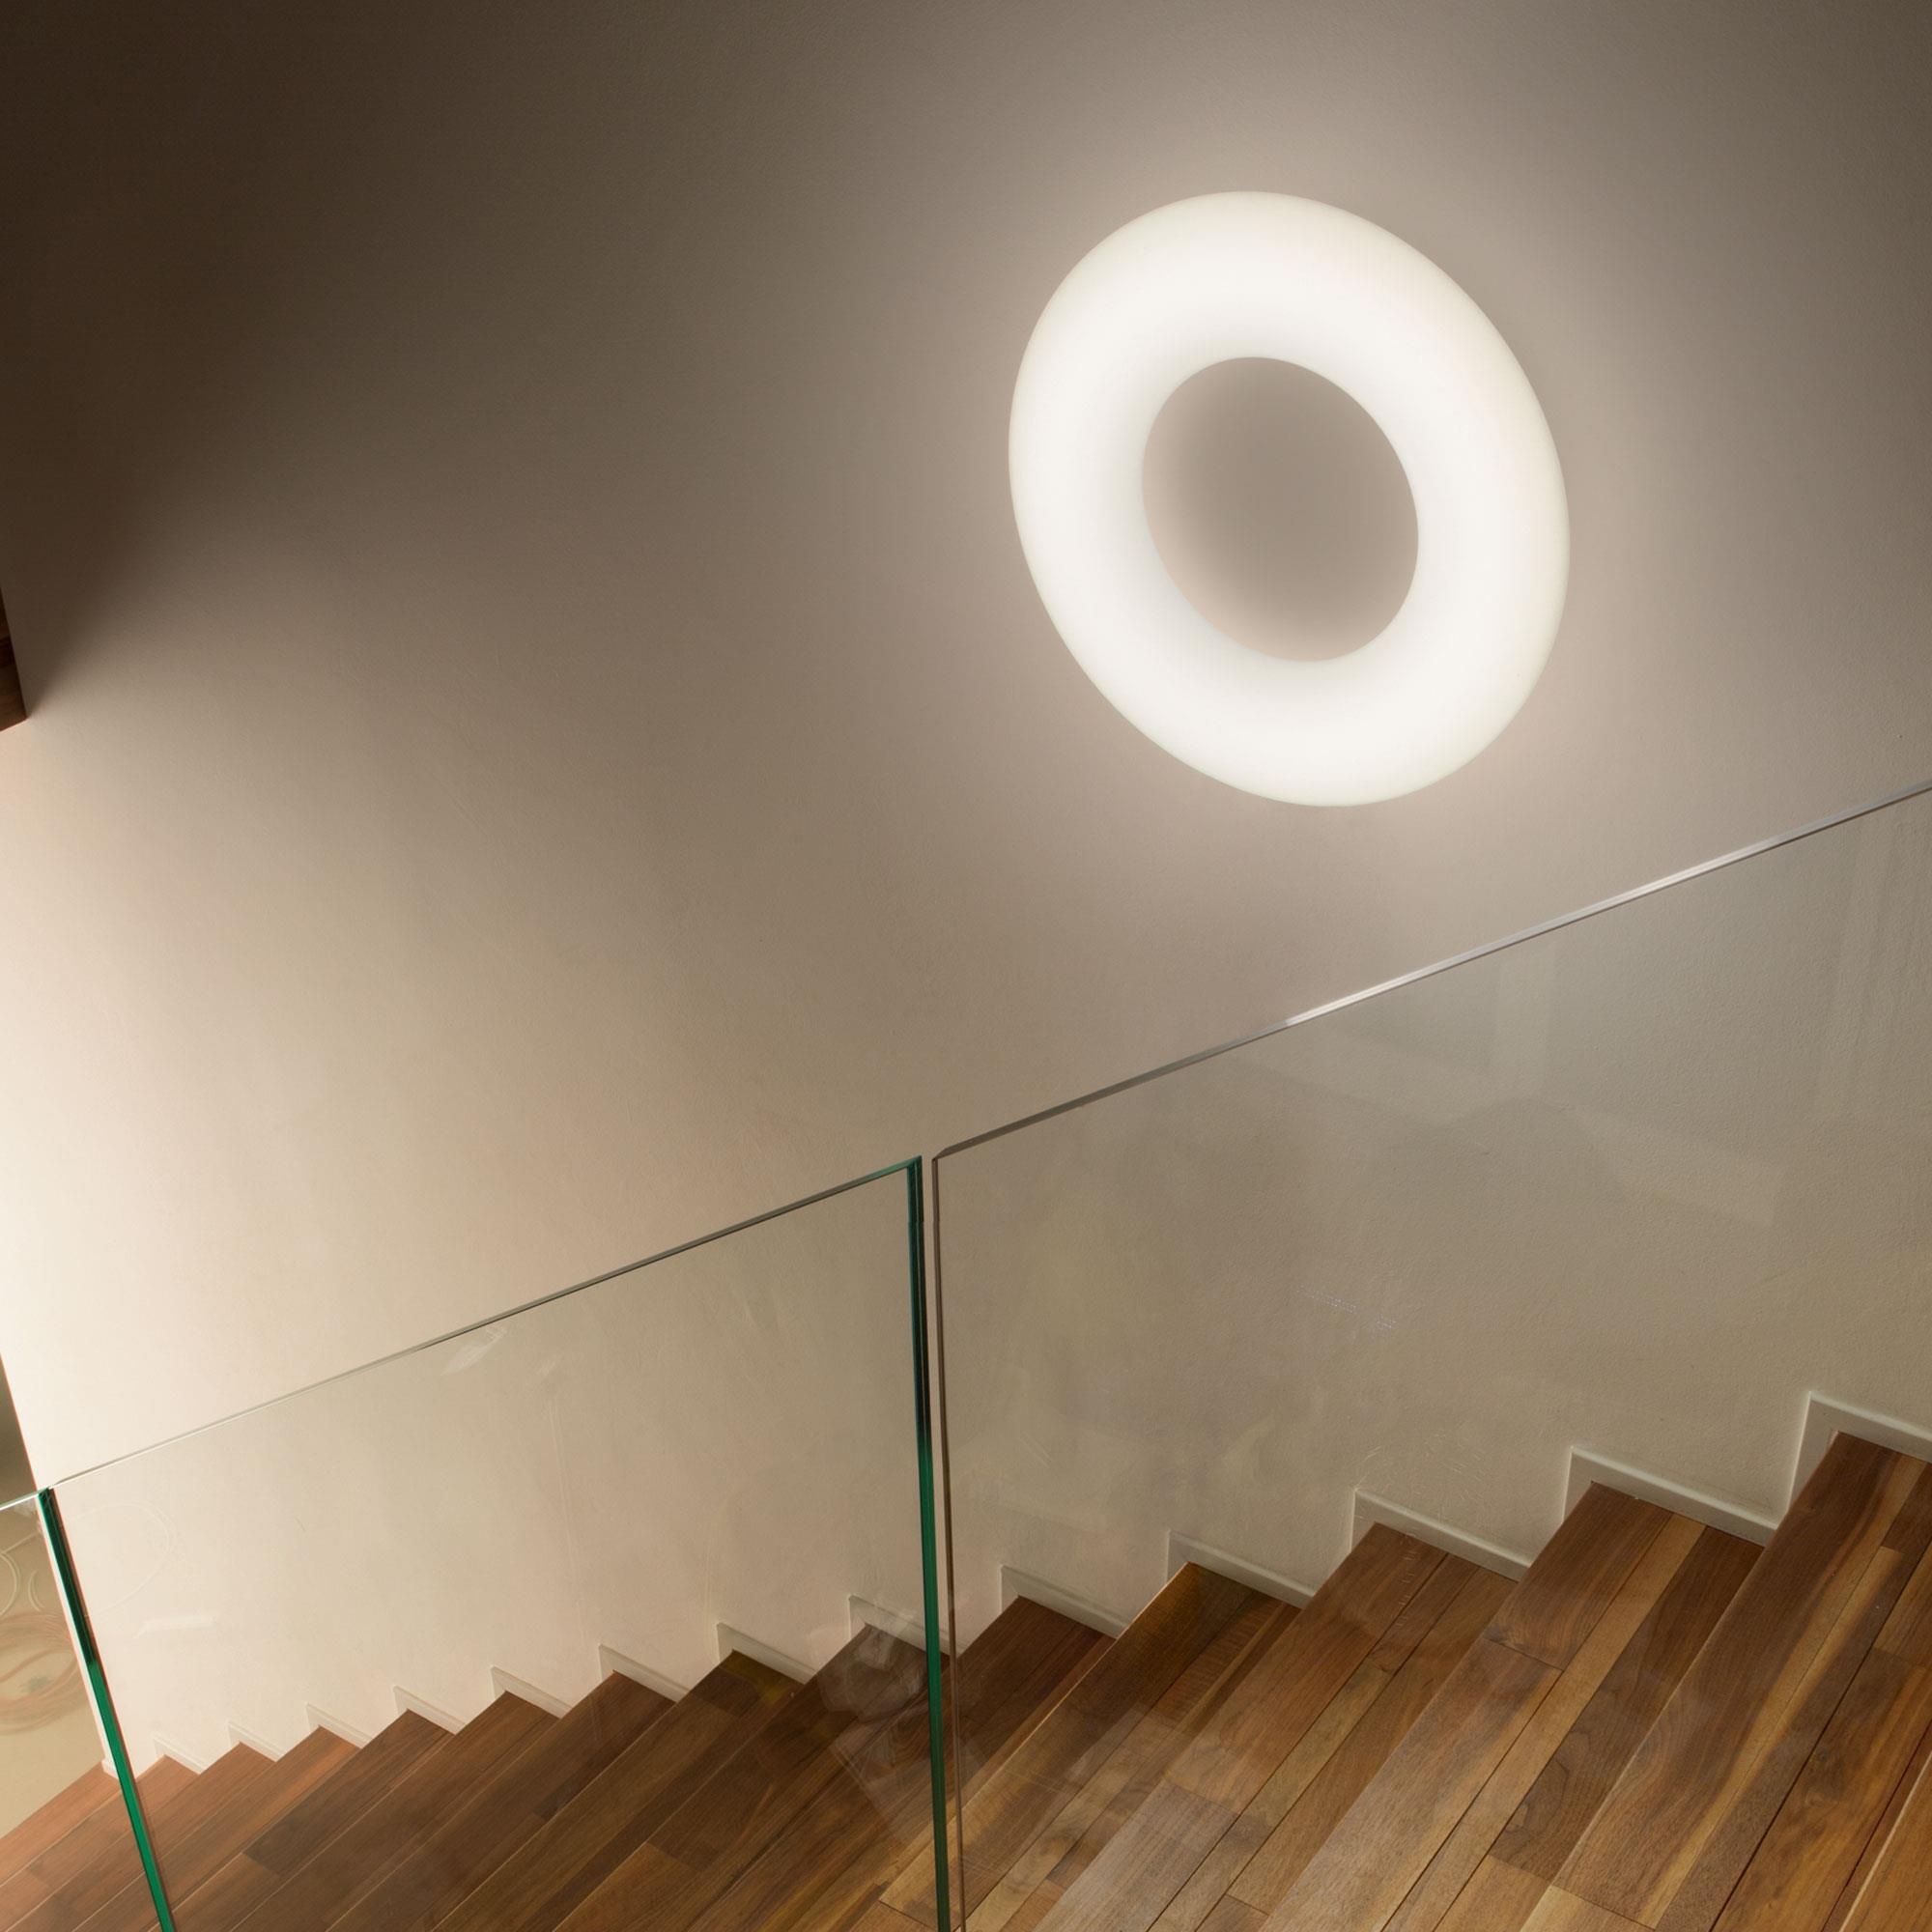 Ideal Lux 140537 POLO PL80 LED fali / mennyezeti lámpa